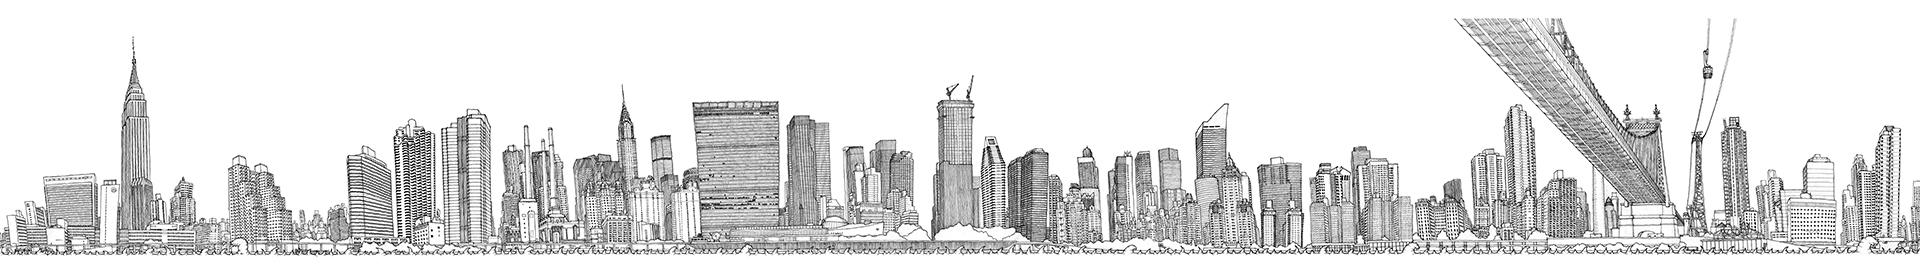 Matteo Pericoli - Manhattan Unfurled